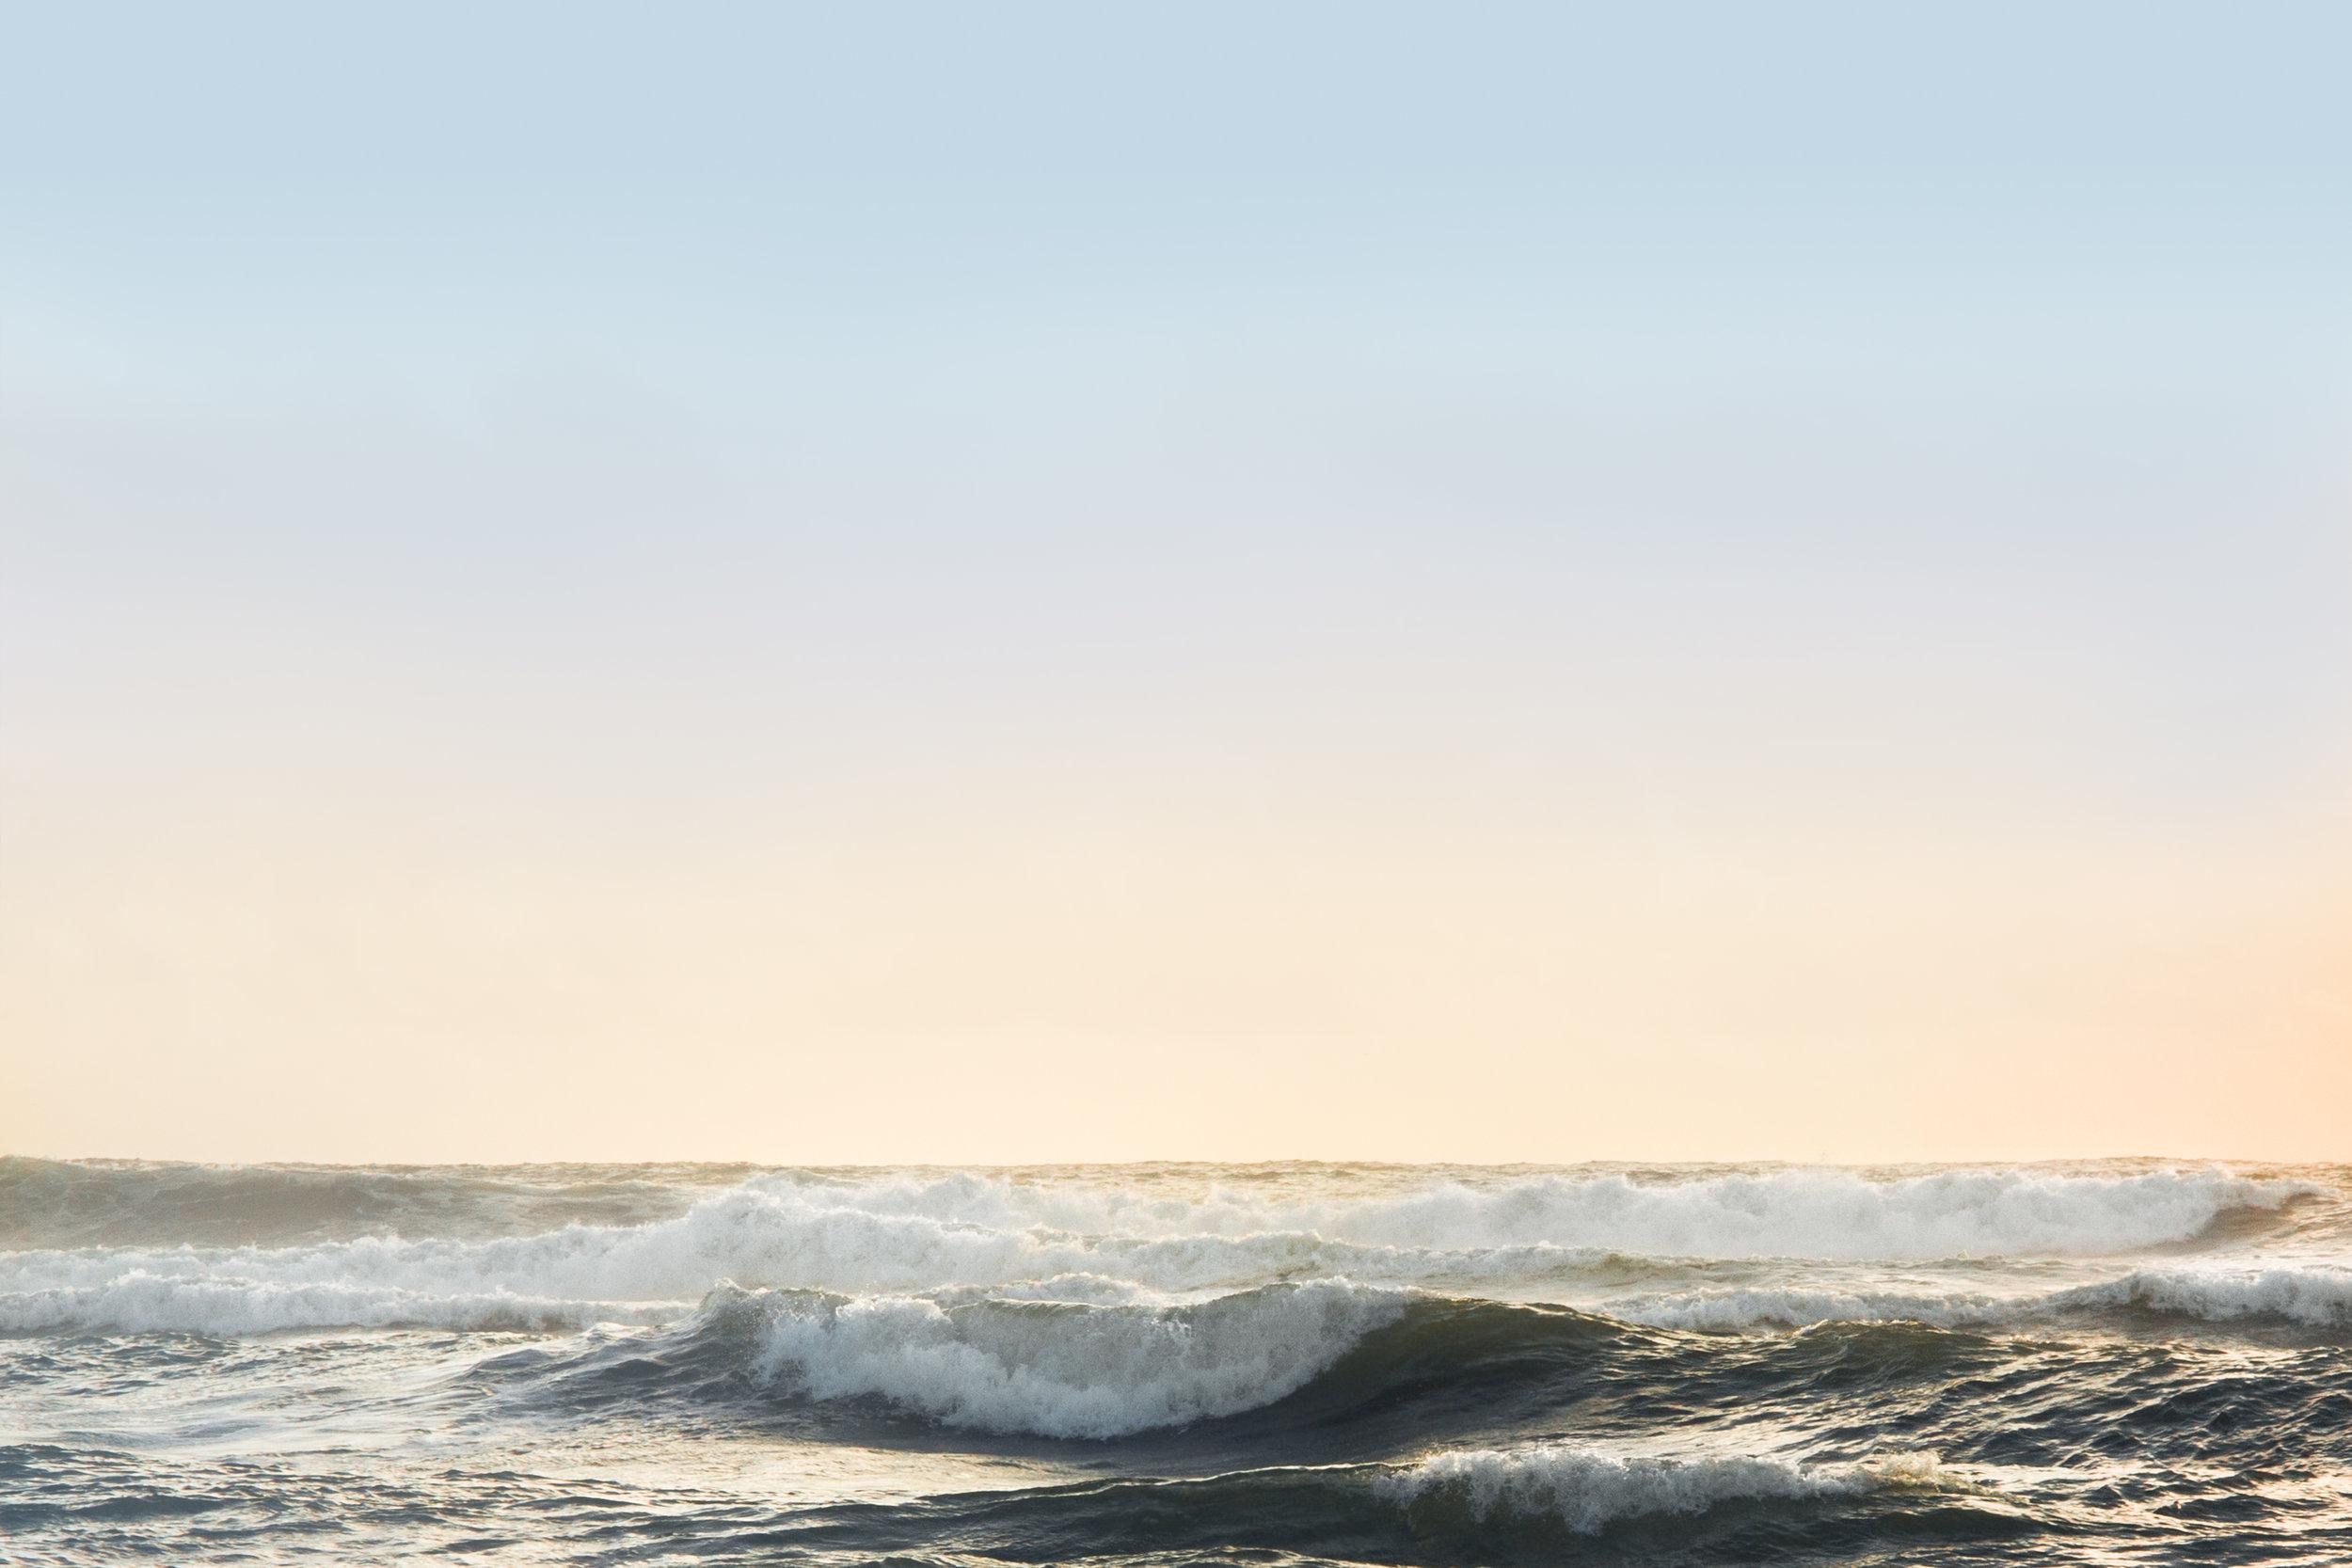 12 SMILING SEA (TOFINO).jpg